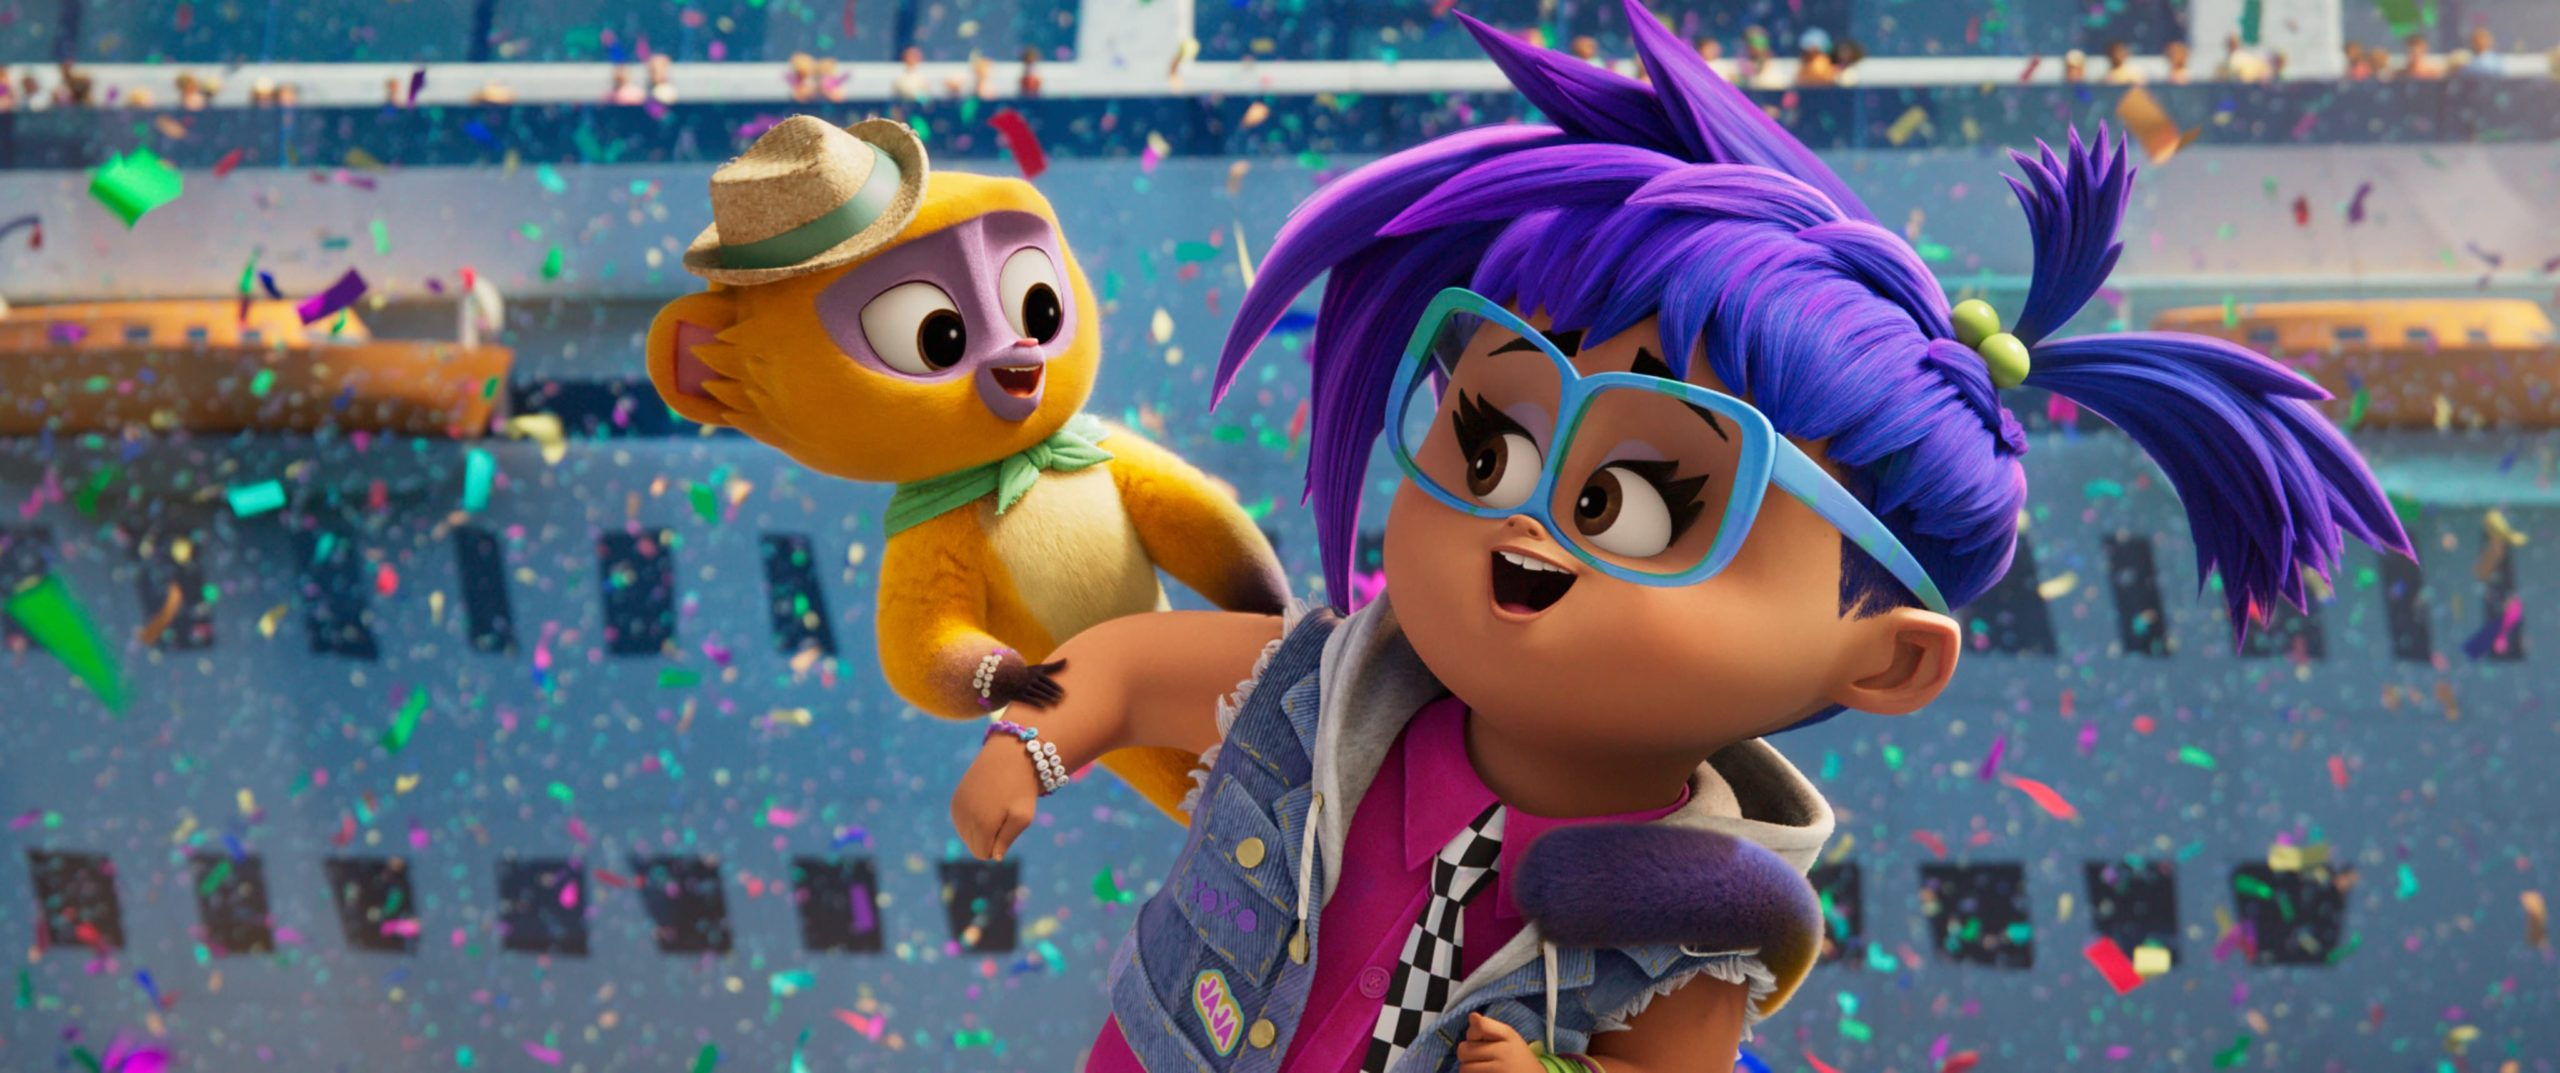 Vivo Movie Review: A Heartfelt & Beautiful Film